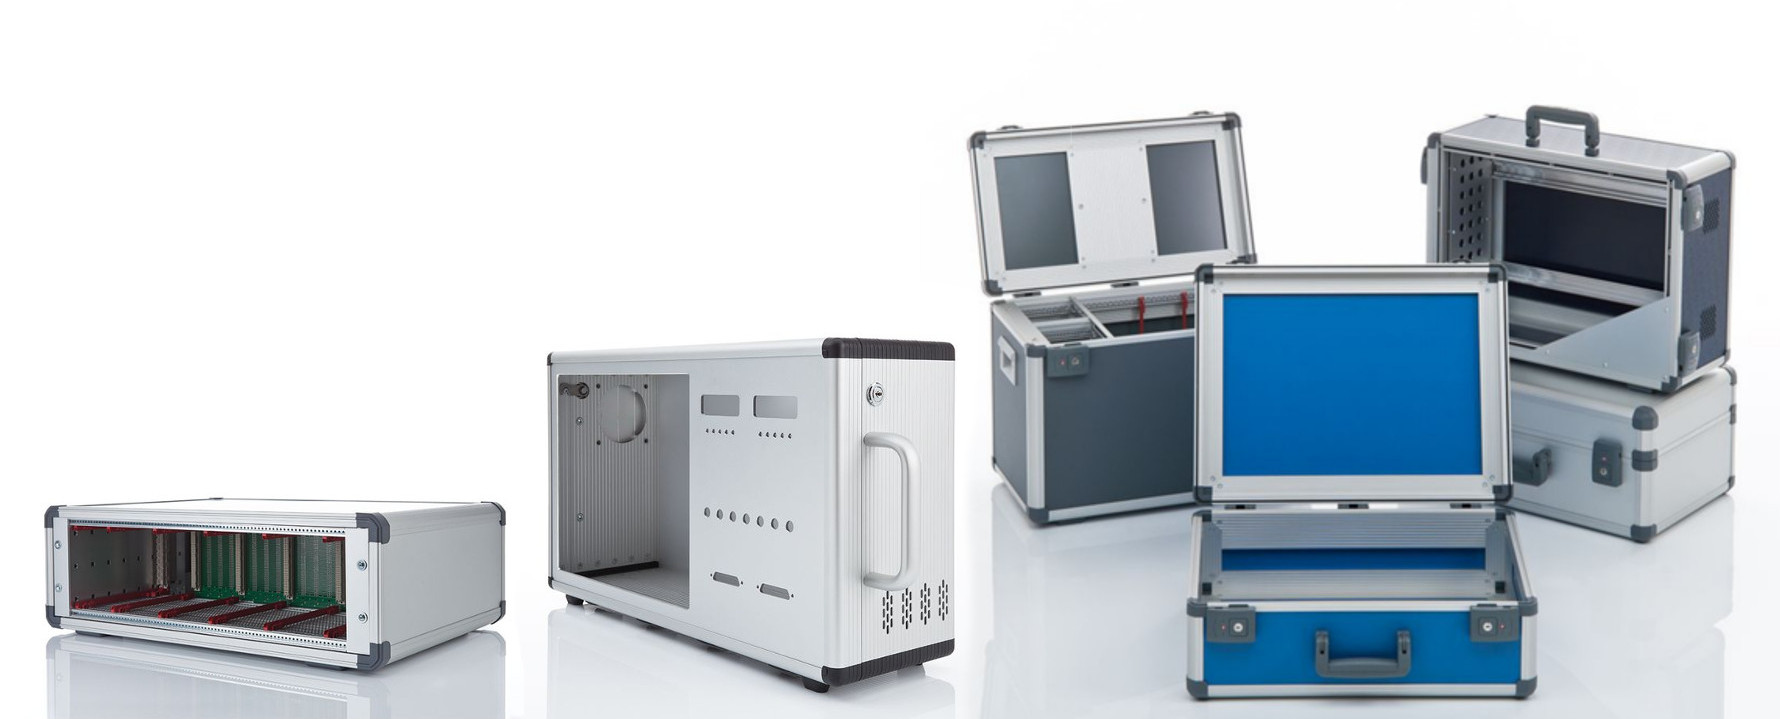 ALUNO - Alu Gehäuse für mobile Elektronik und Technik